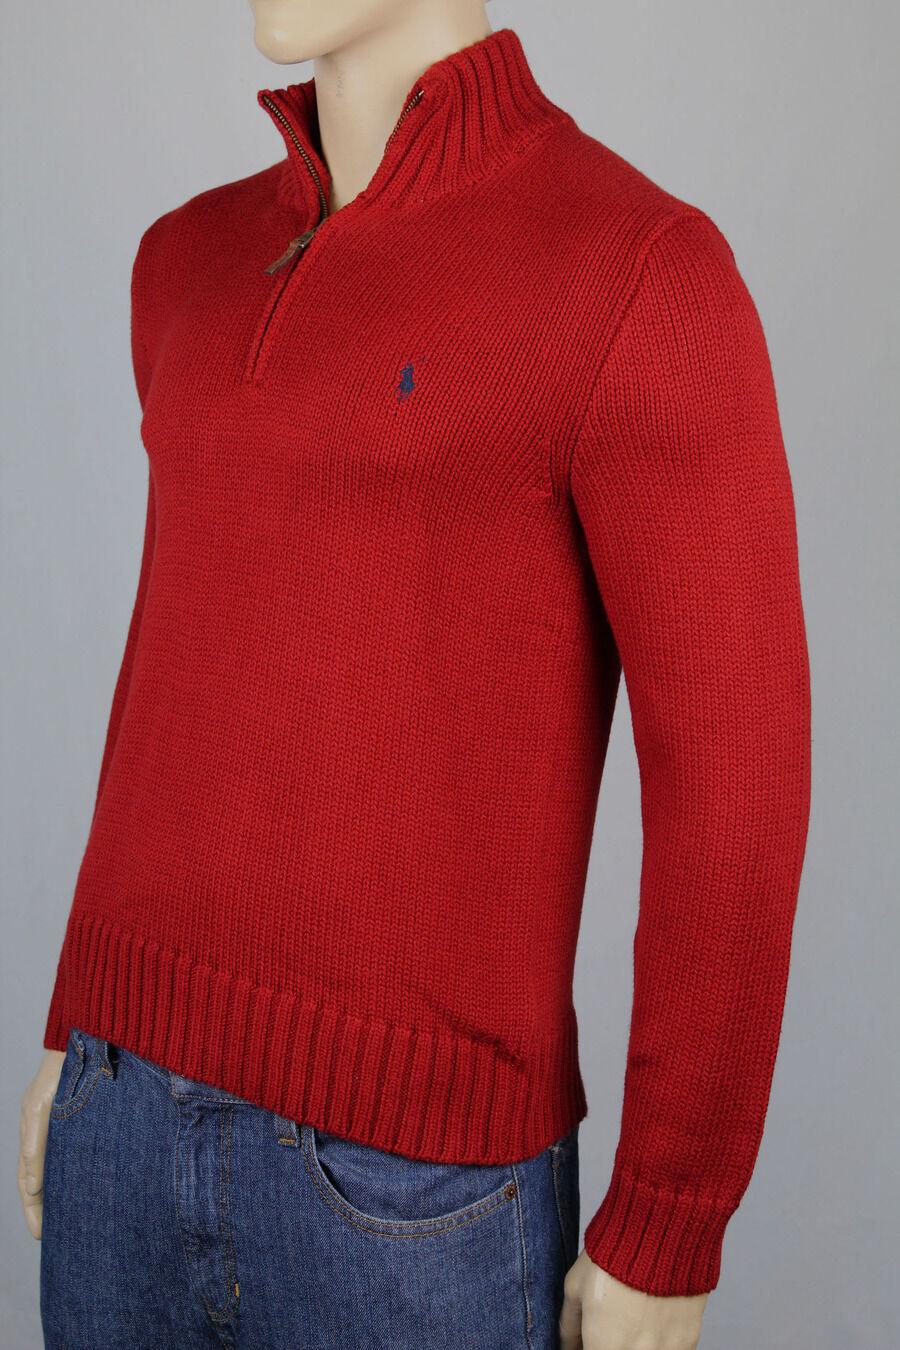 Polo Ralph Lauren L Rot 1 2 Sweatshirt Blau Pony Nwt